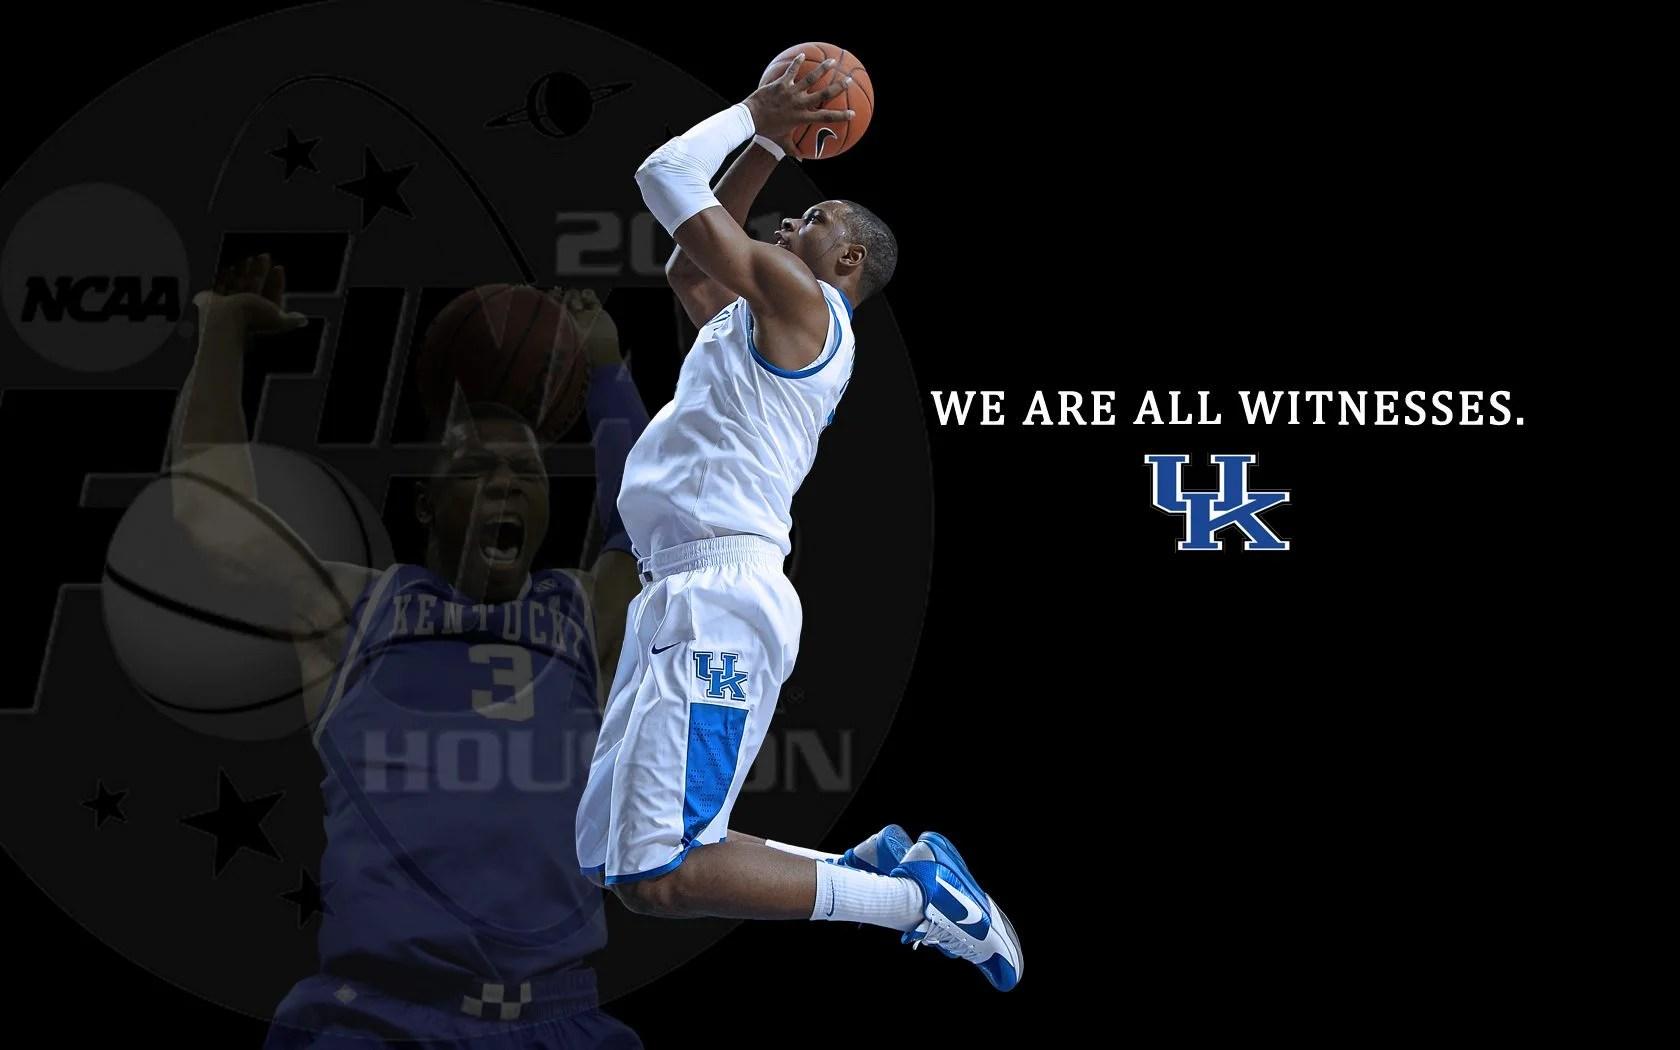 New Kentucky Basketball Wallpaper Uploaded